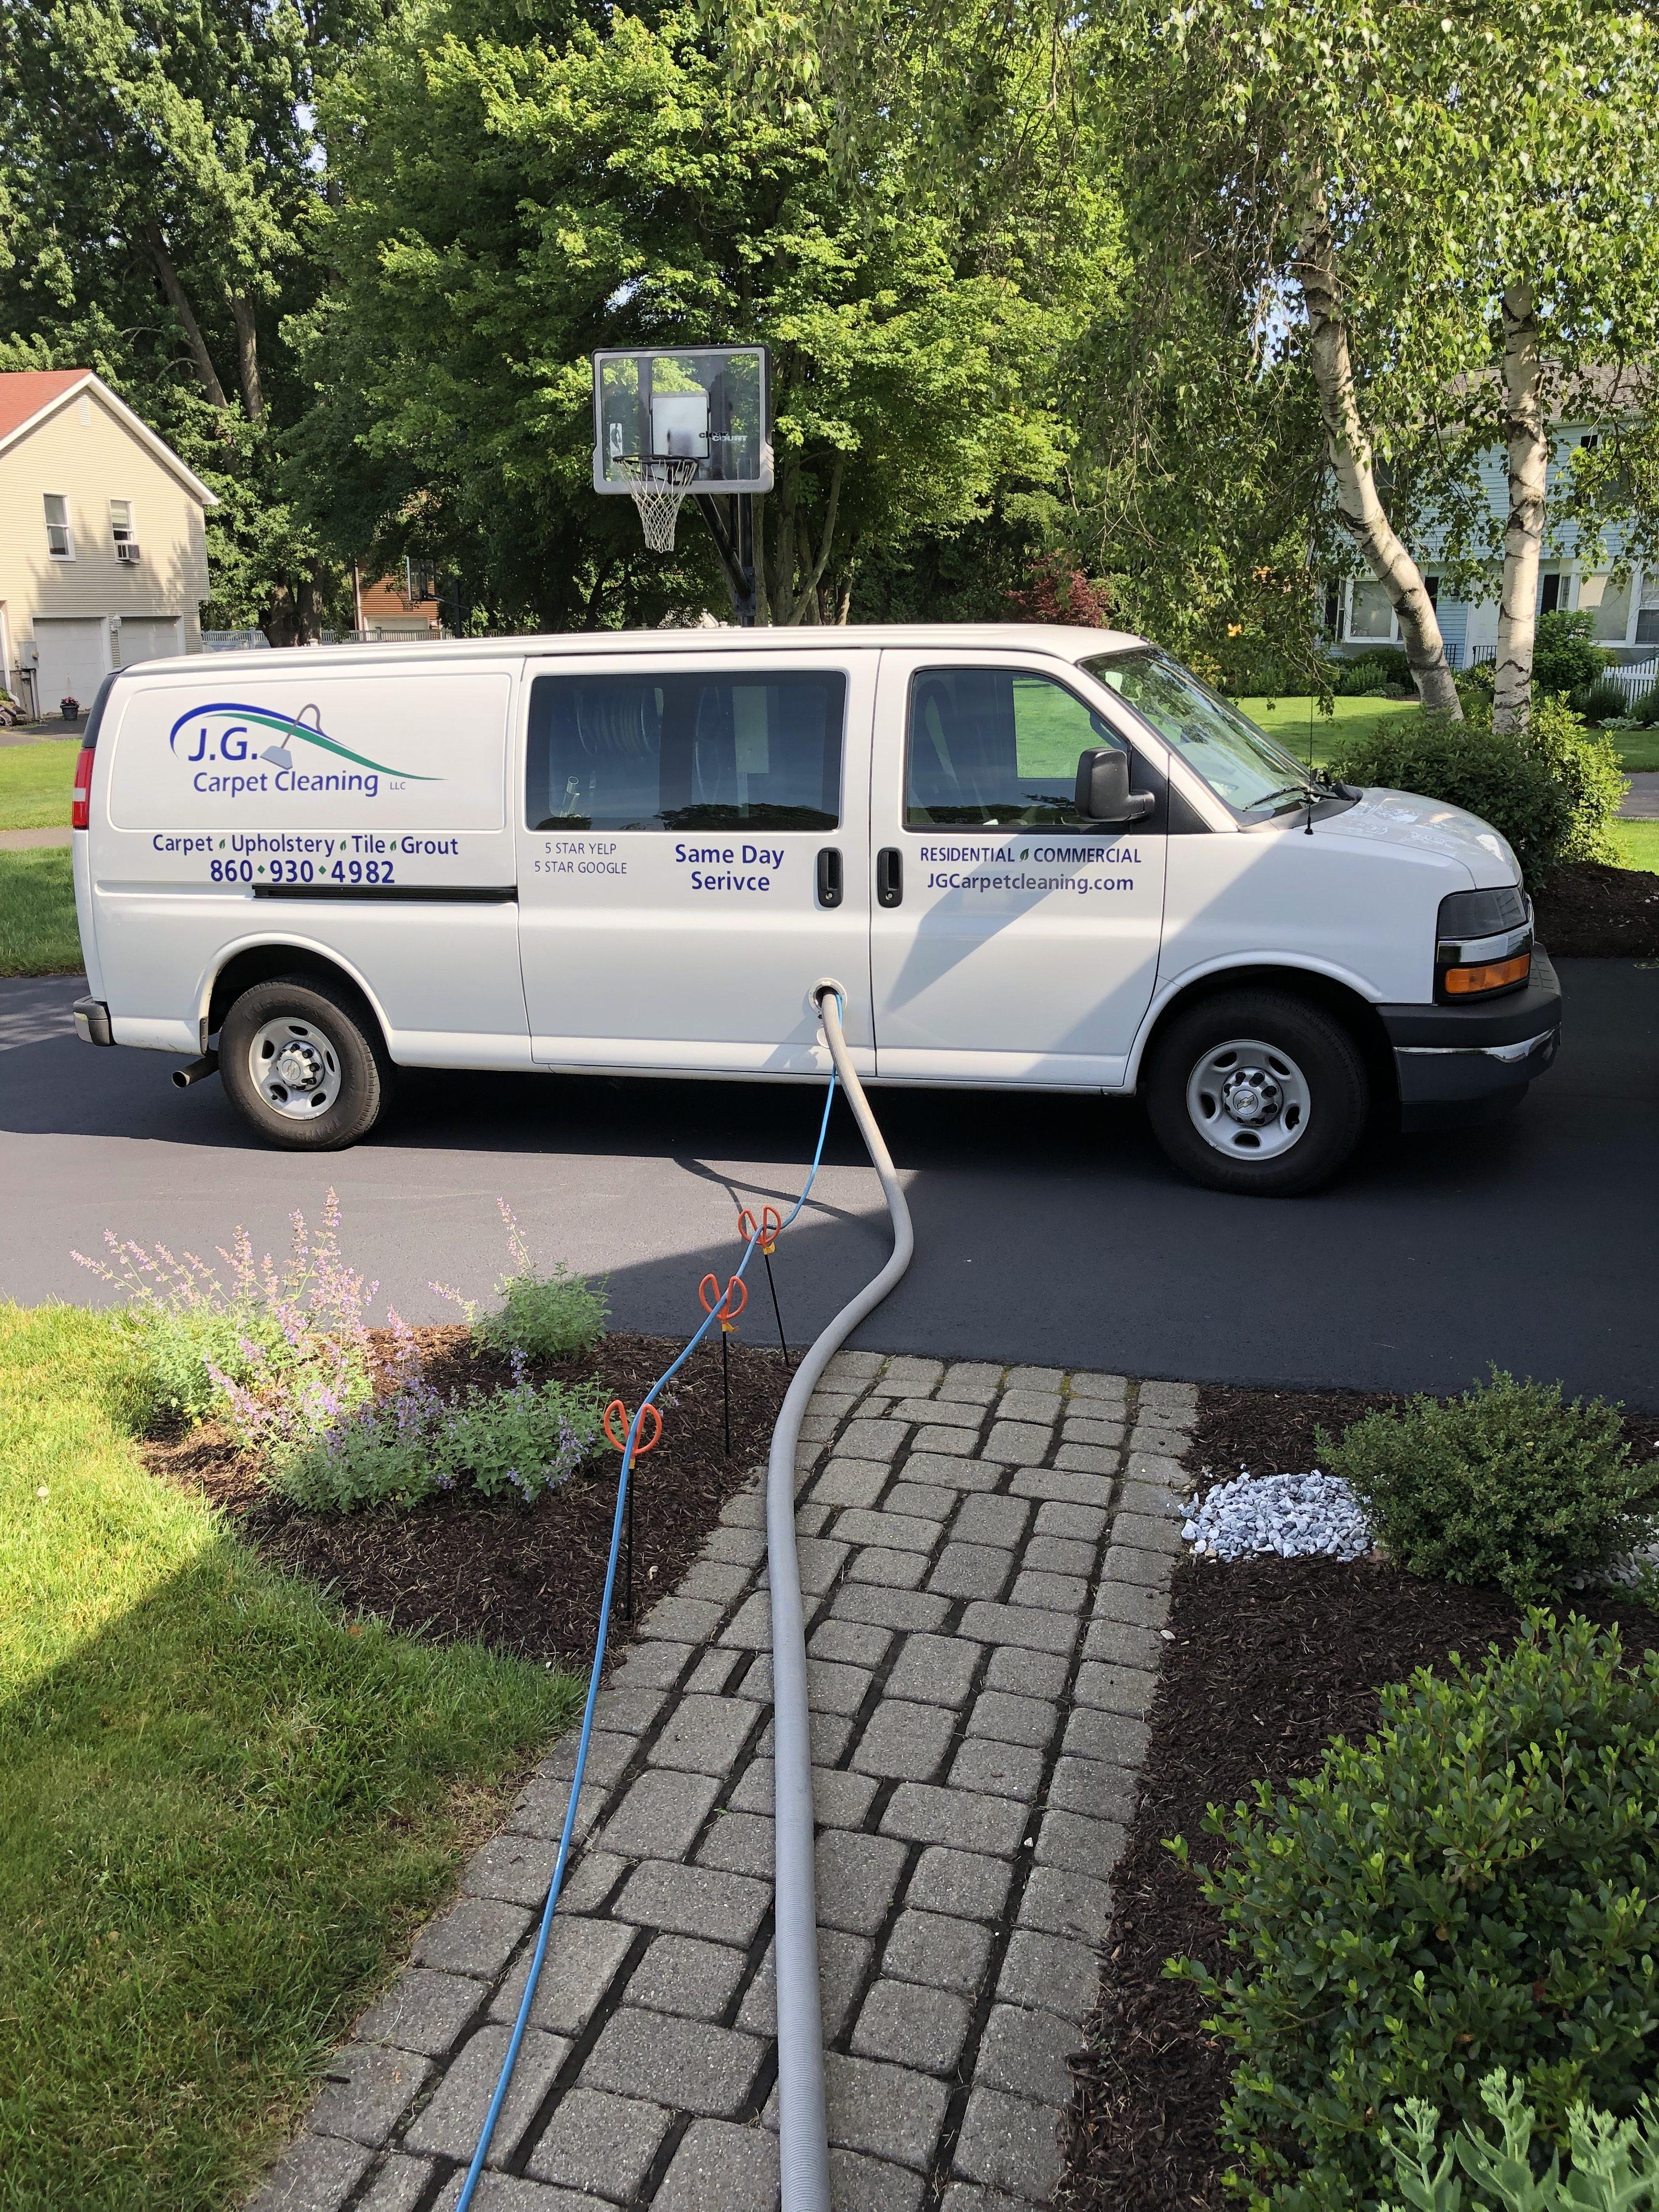 JG Carpet Cleaning